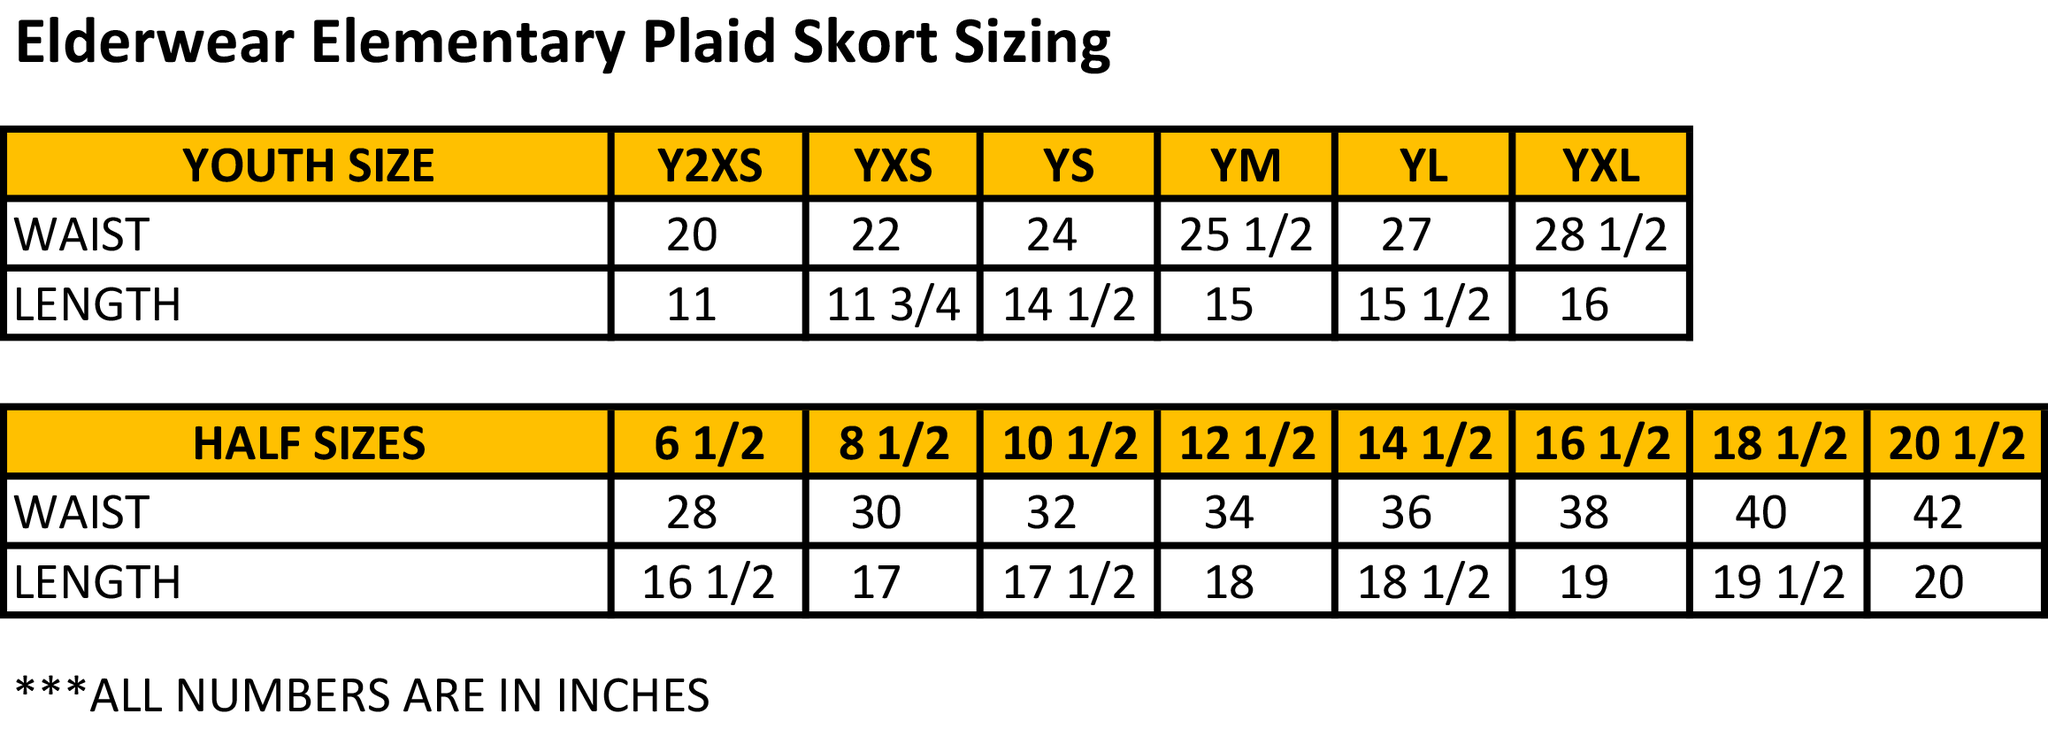 Elementary Plaid Skort Size Chart